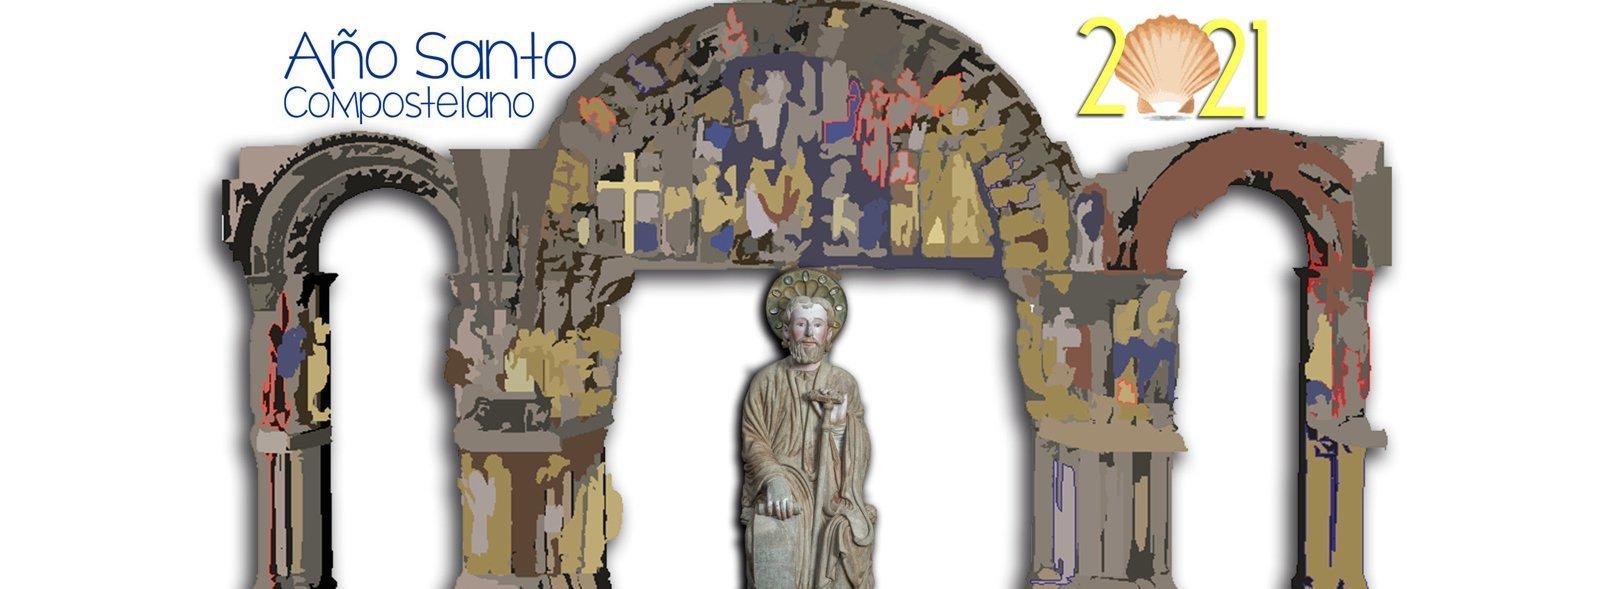 año santo 2021 para slide portada web oficina peregrino